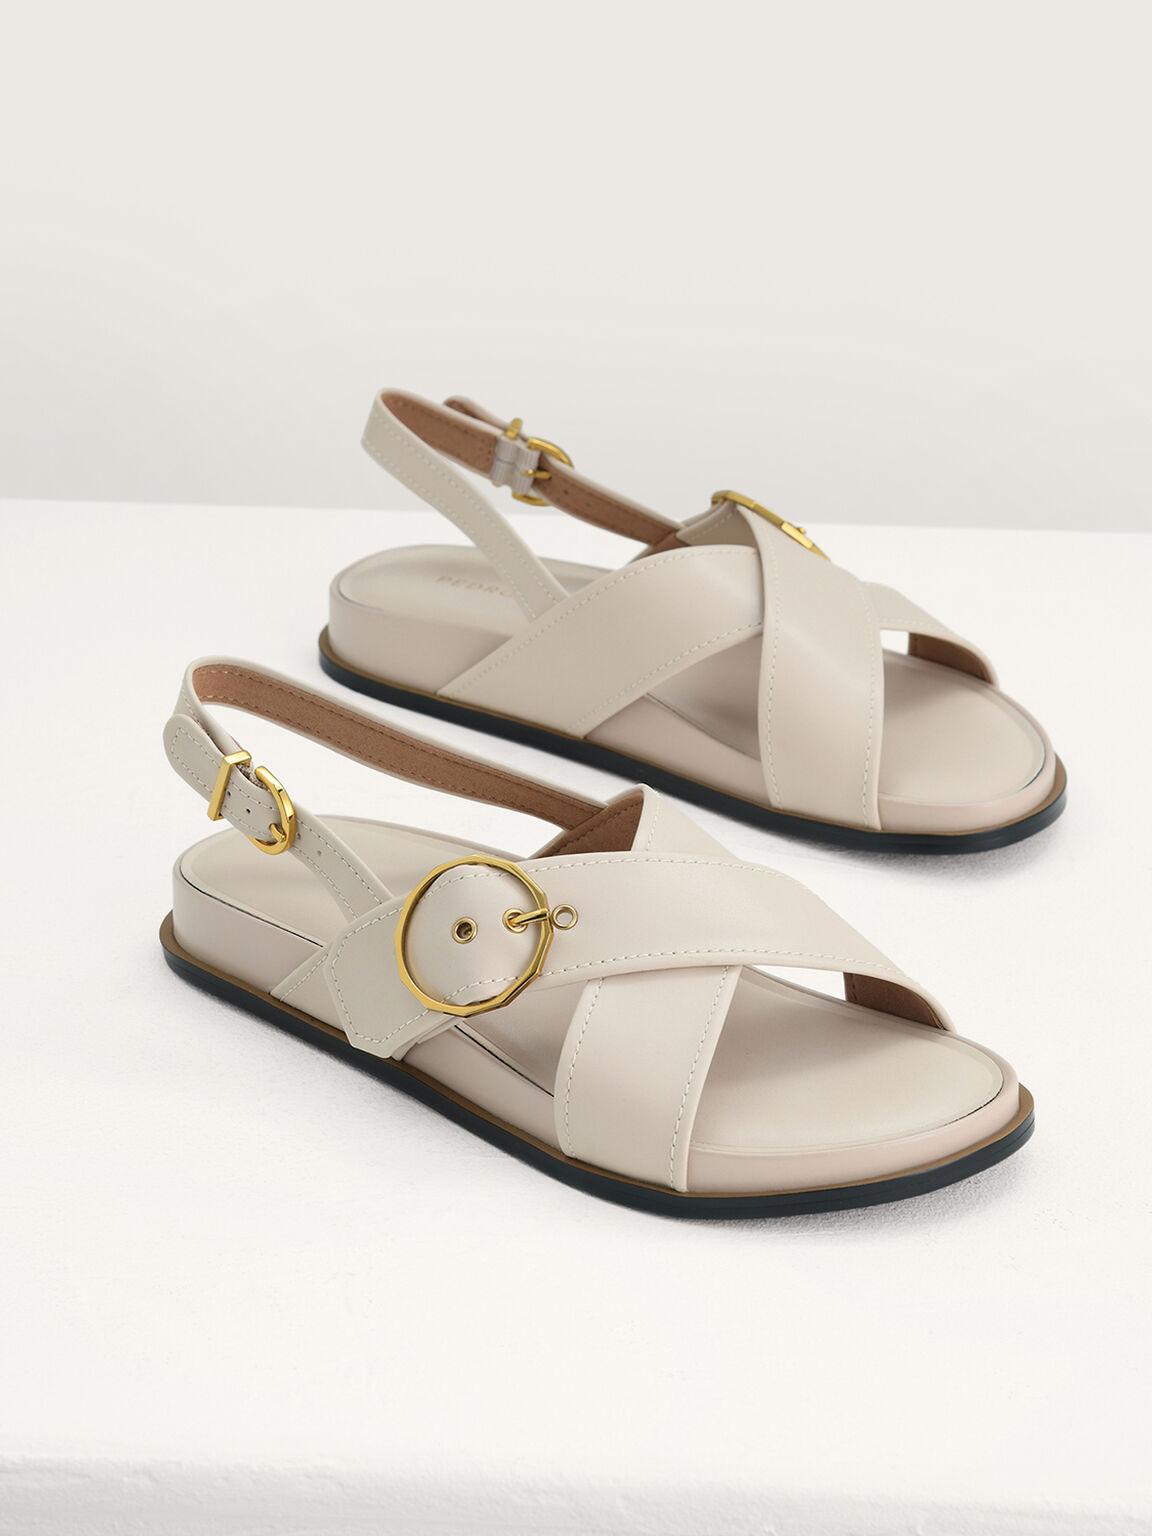 Platform Slingback Sandals, Cream, hi-res